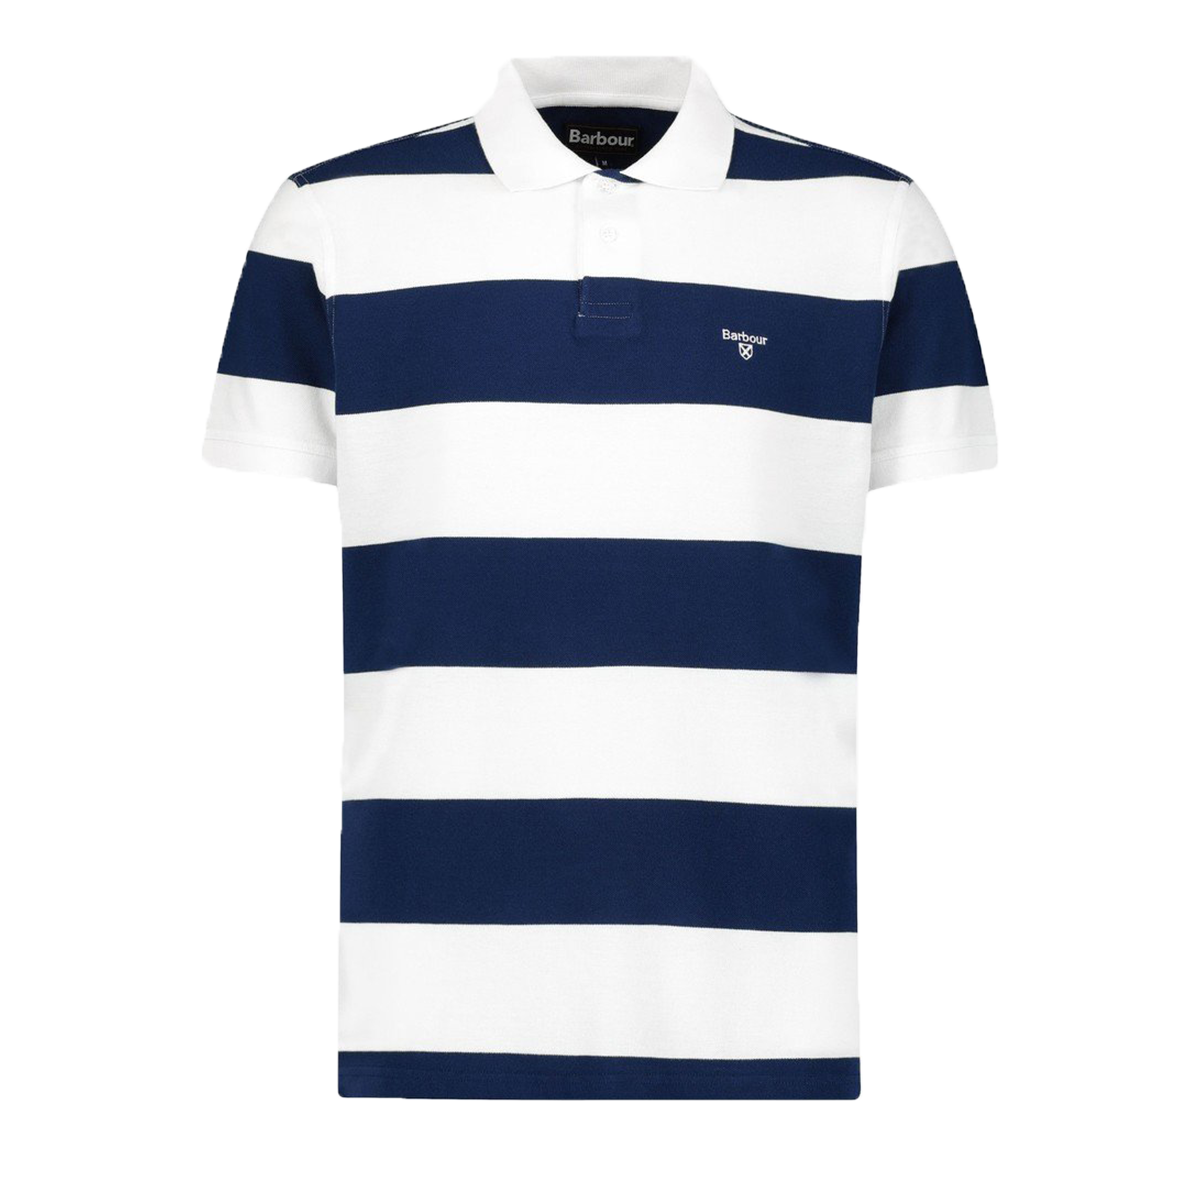 Barbour-Harren-Stripe-Polo–Regal-Blue